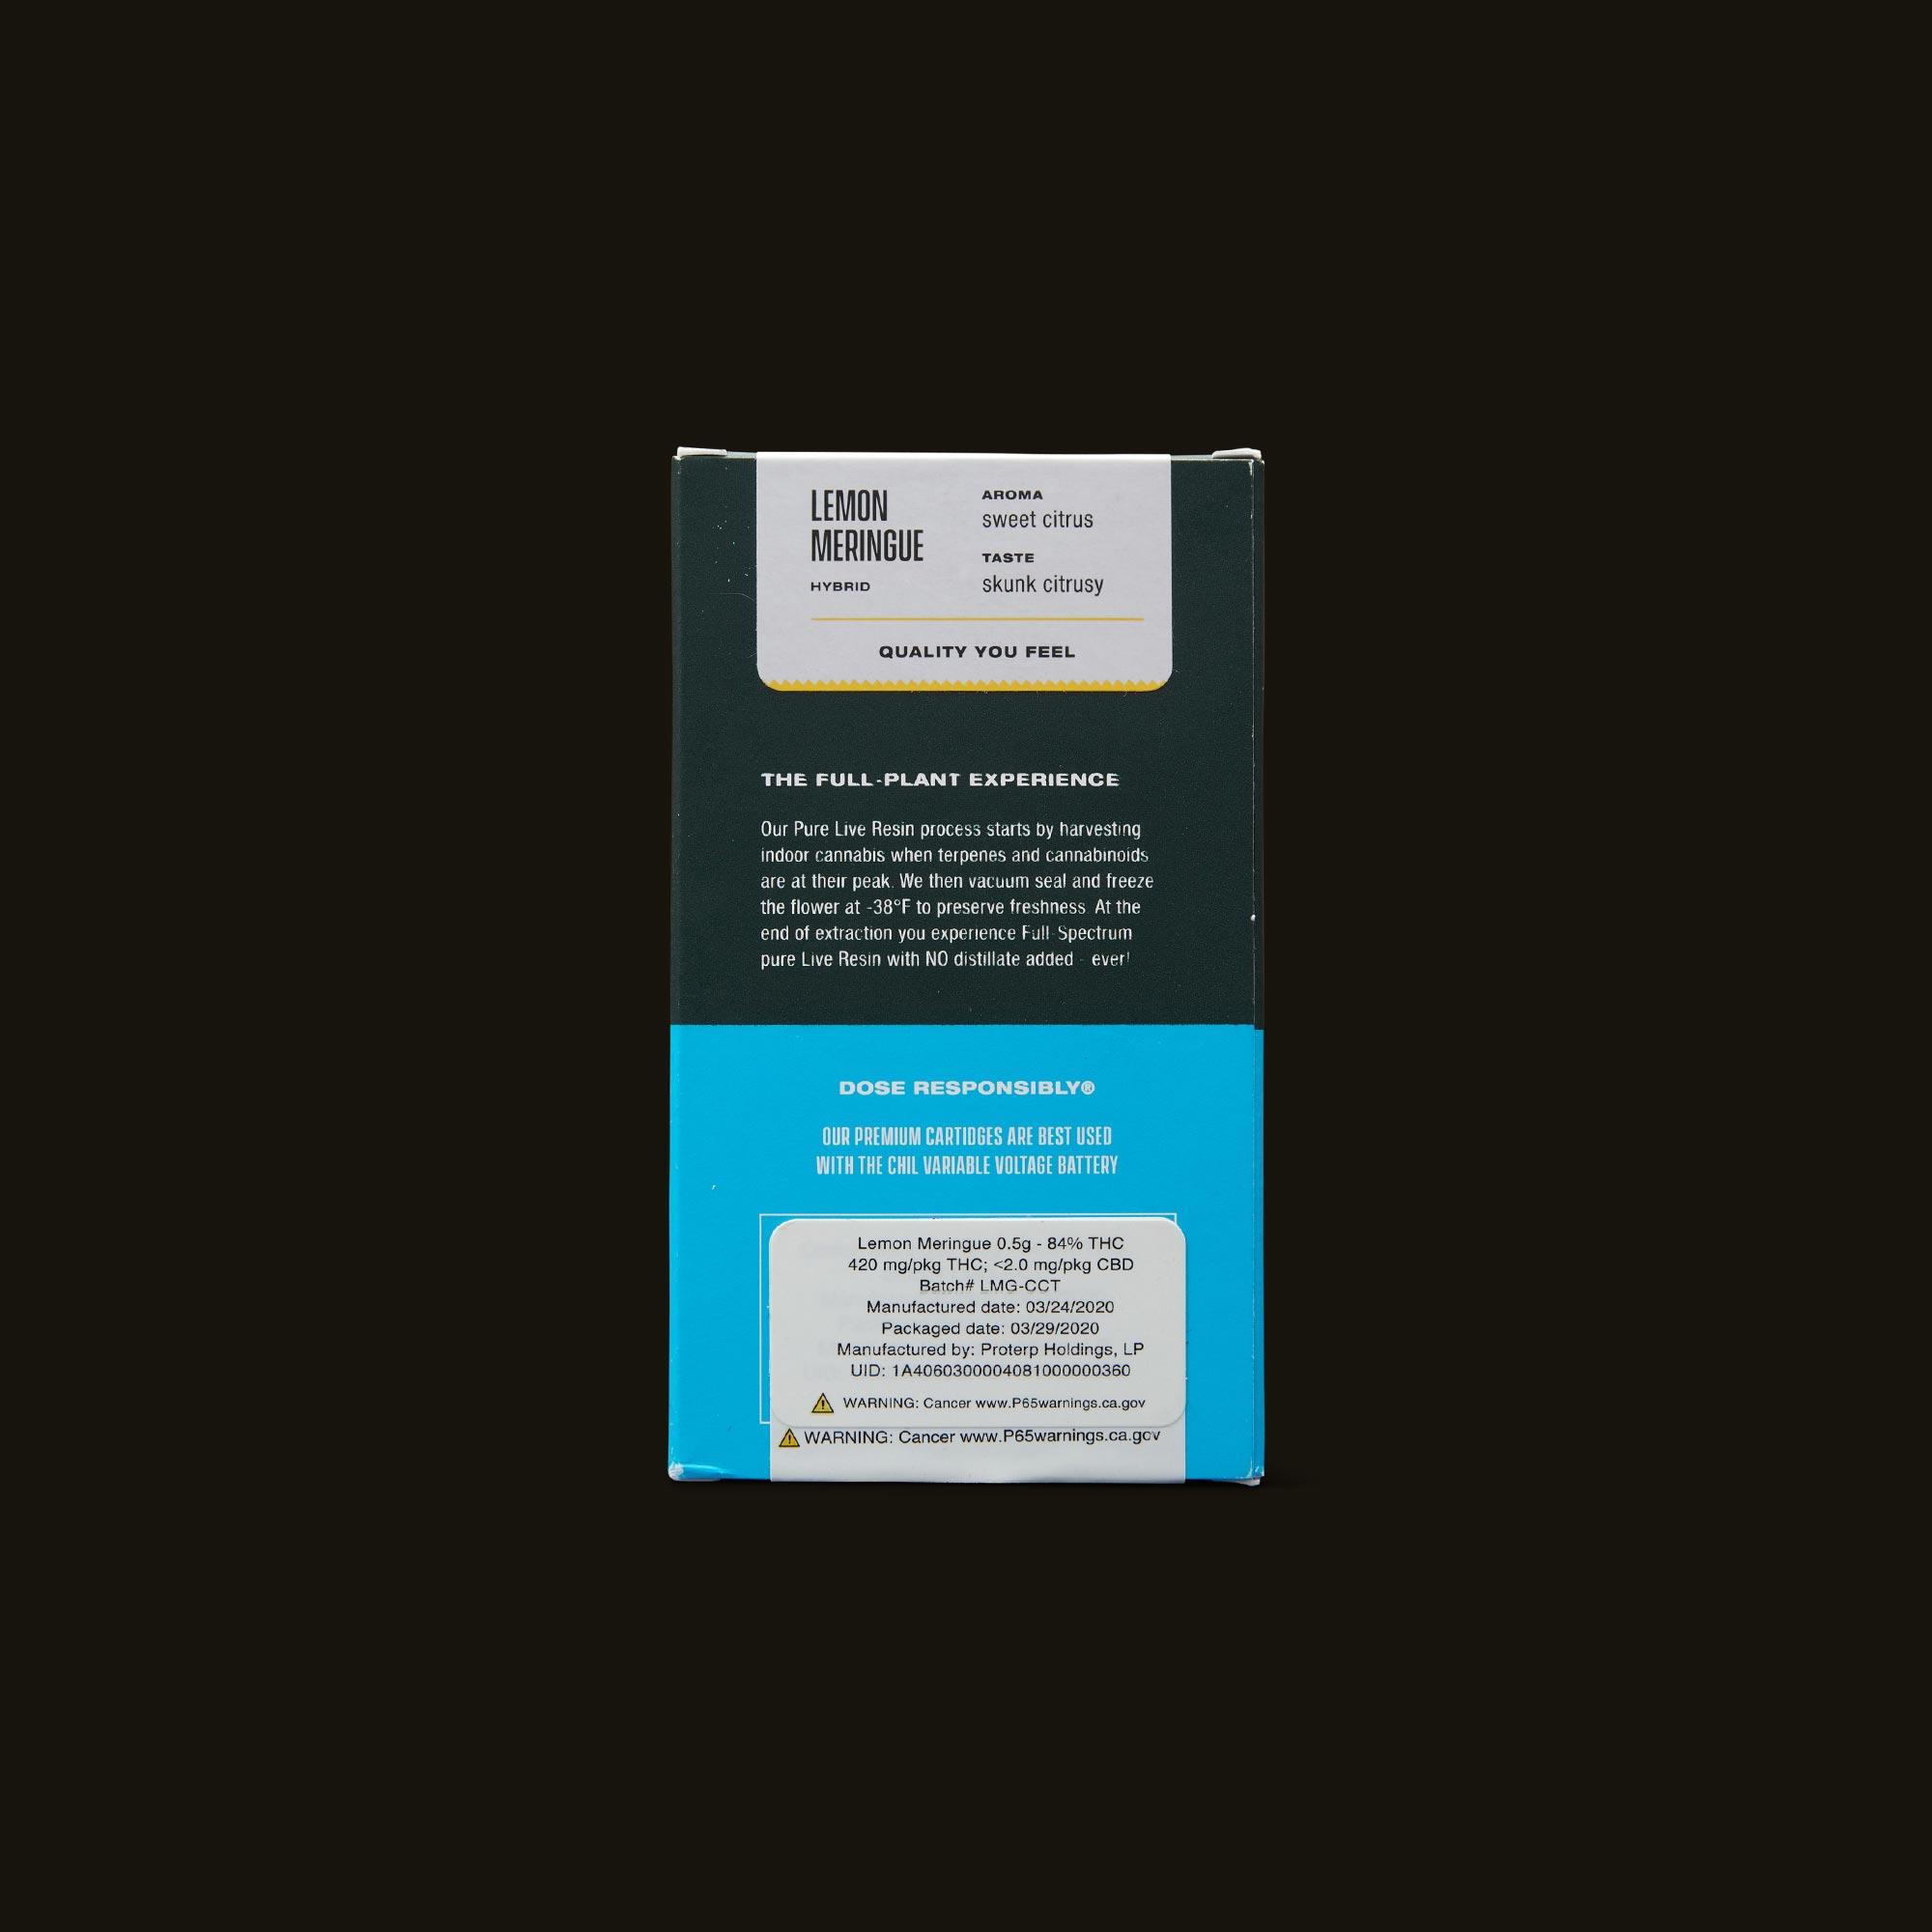 Chil Lemon Meringue Pure Live Resin Cartridge Ingredients